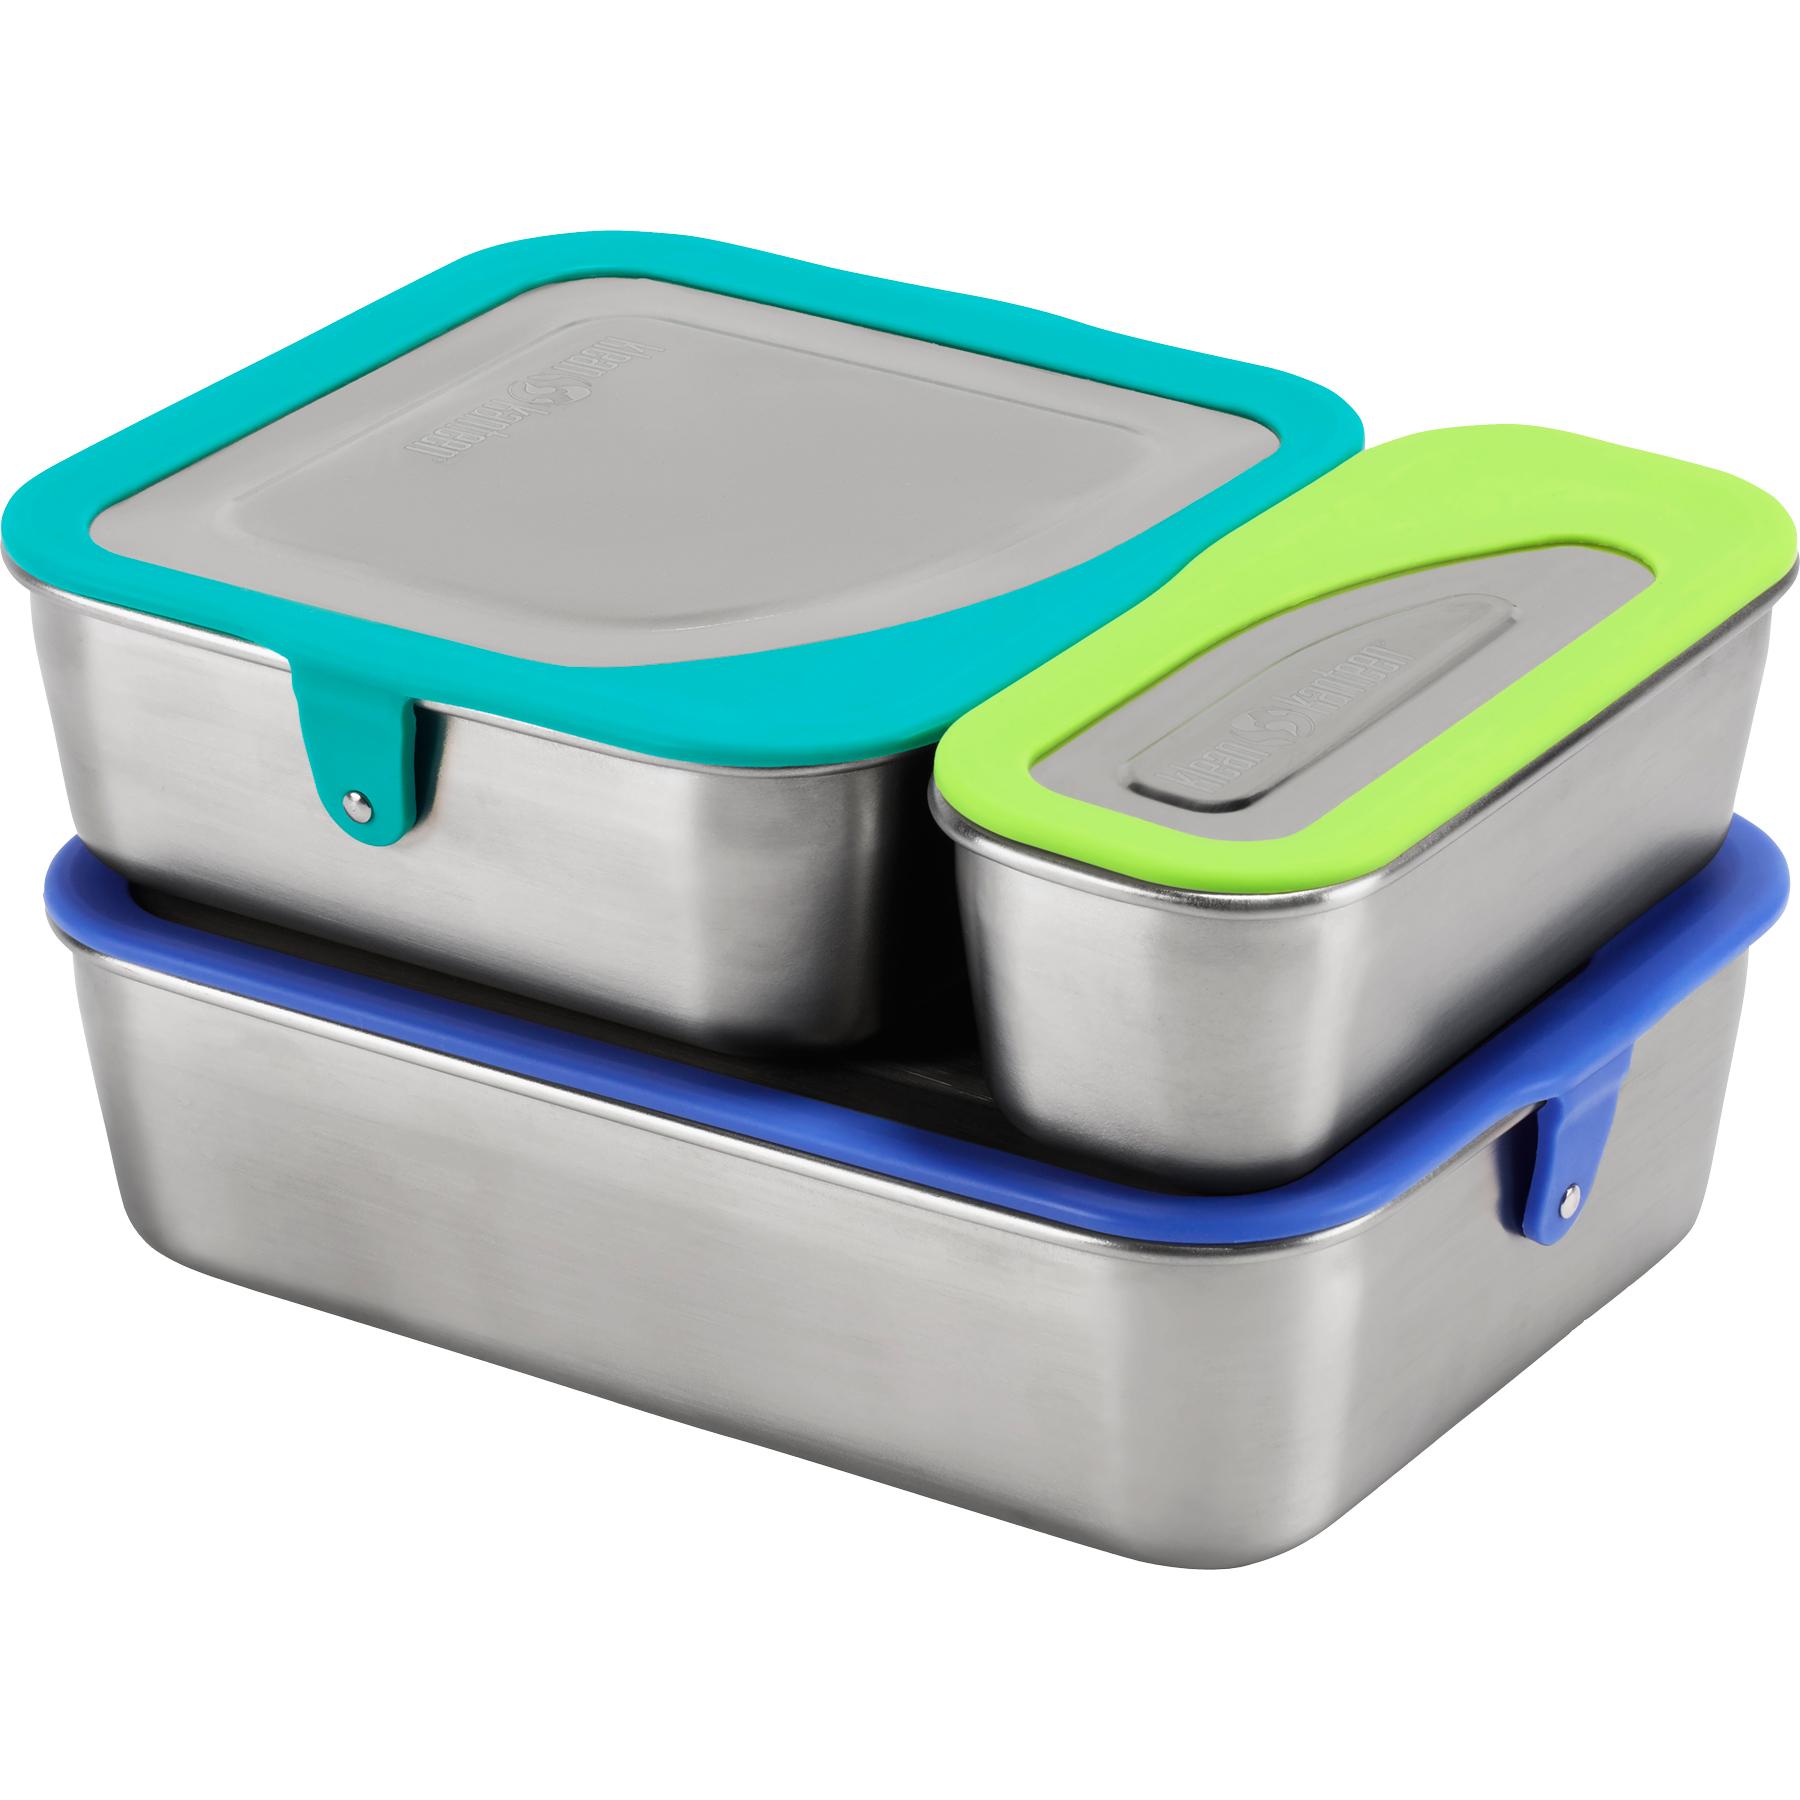 Klean Kanteen Food Box Set - multi color